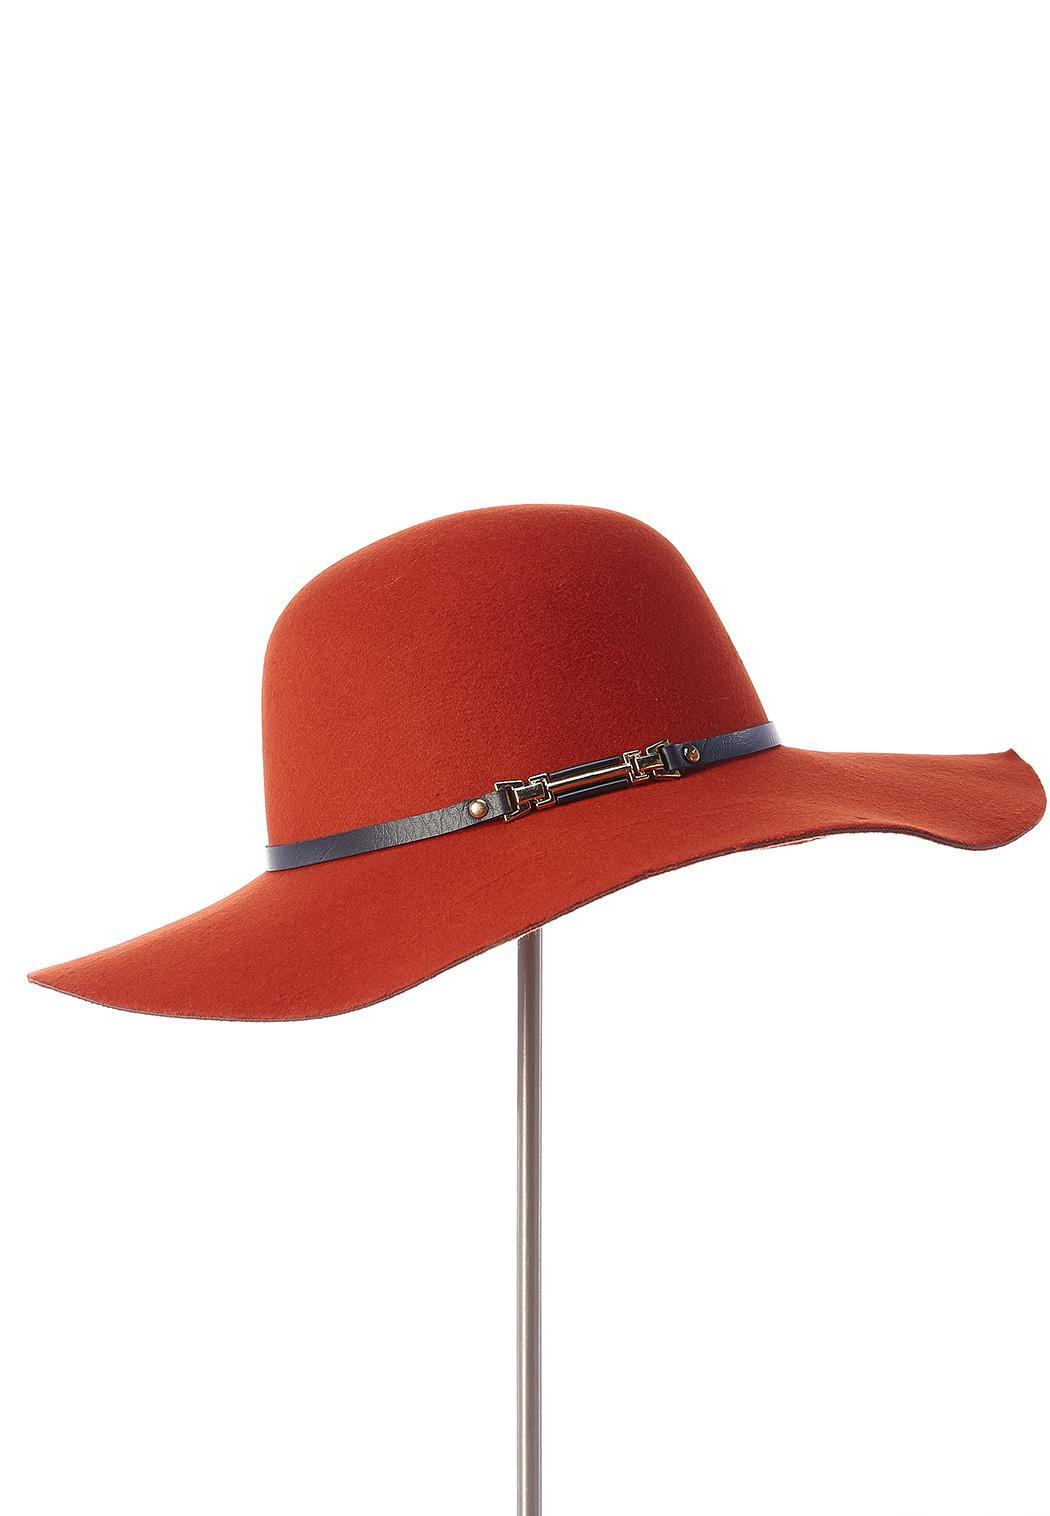 Buckle Strap Panama Hat